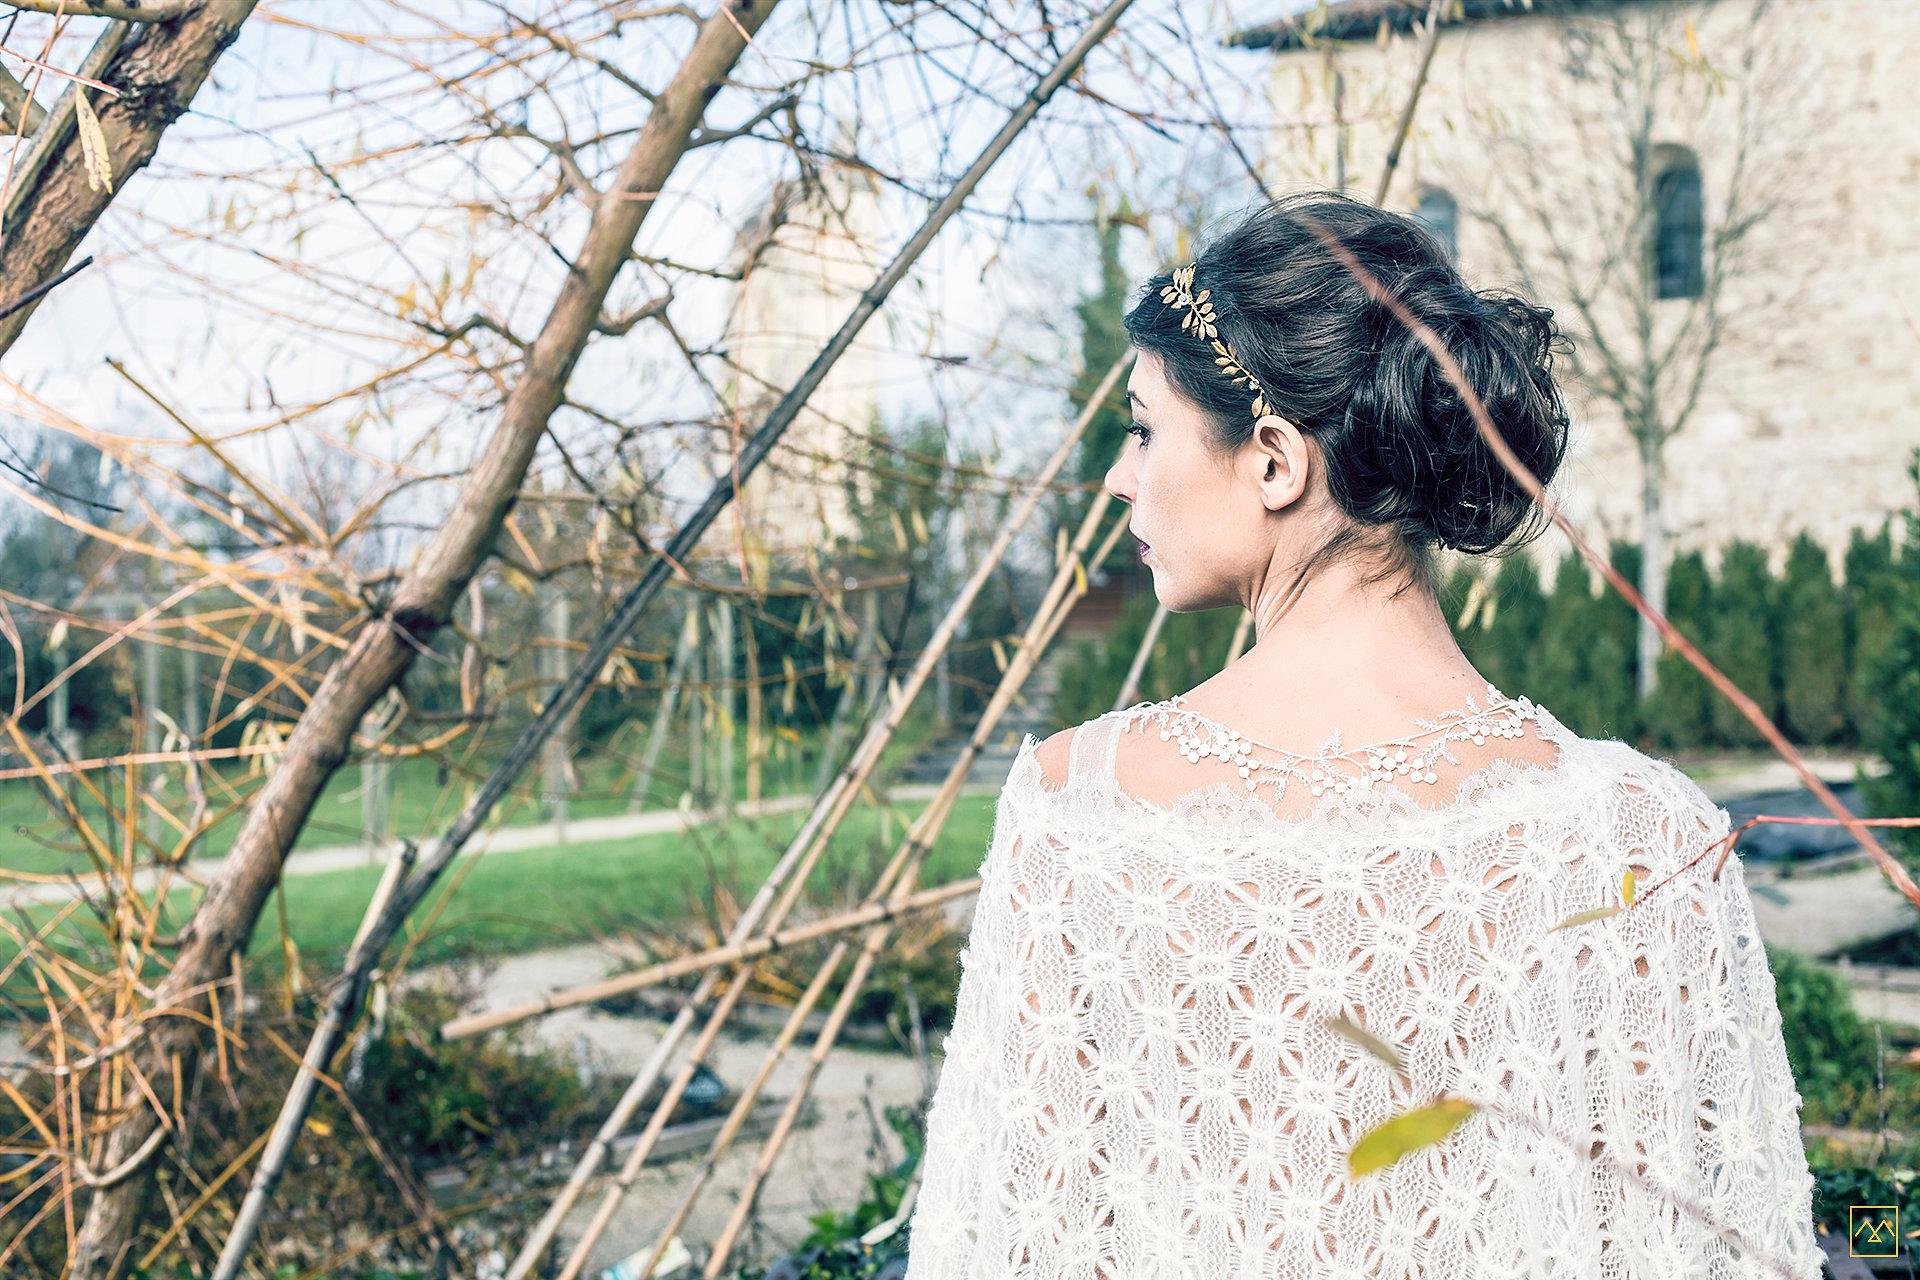 maquillage coiffure lyon 19 anna cruz maquillage et coiffure mariage lyon shooting inspiration collection 2017 - Coiffeuse Maquilleuse Mariage Lyon